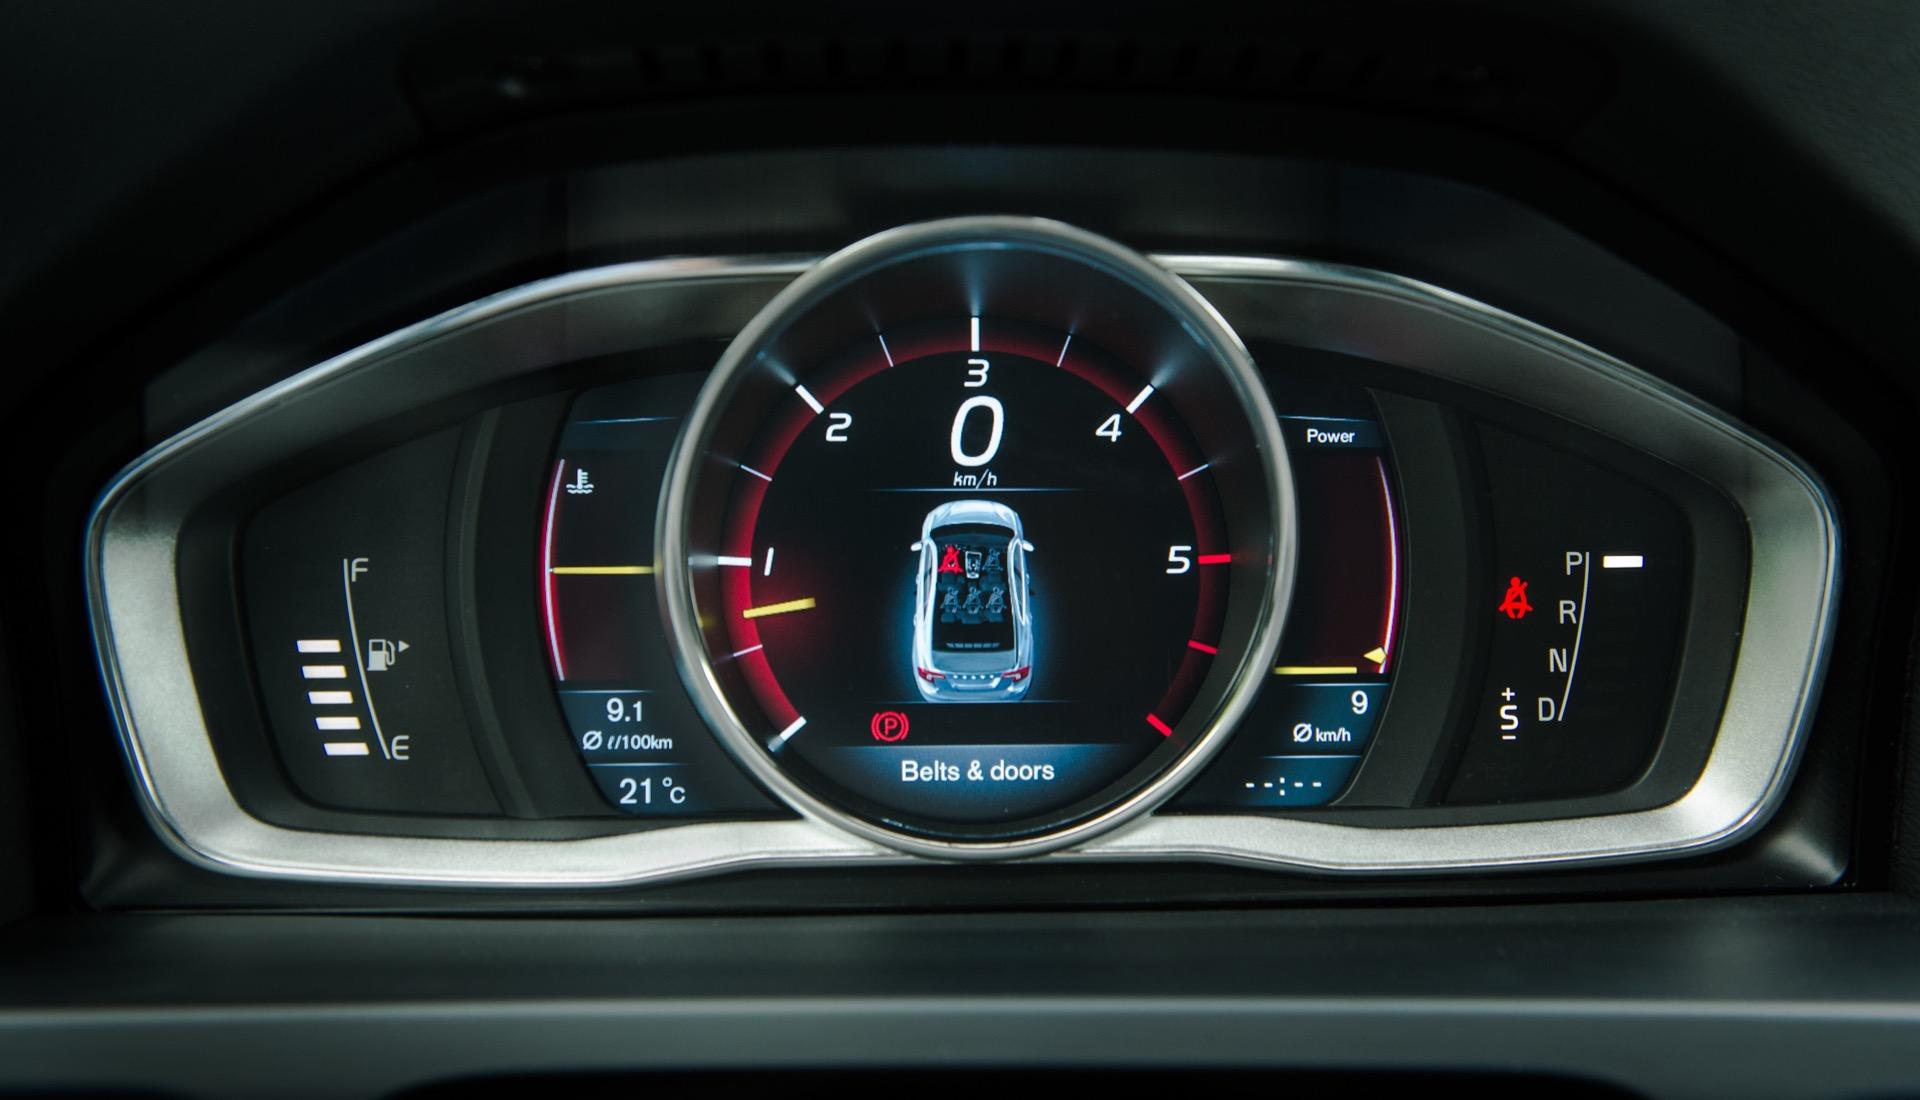 Volvo S60 -  2013, 2014, 2014 S60, Images, Interior, S60, Volvo